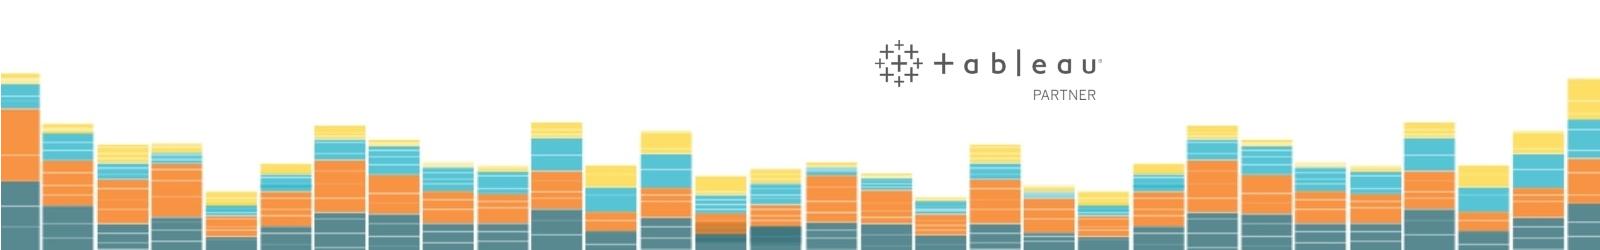 bi-analytics-tableau-partner